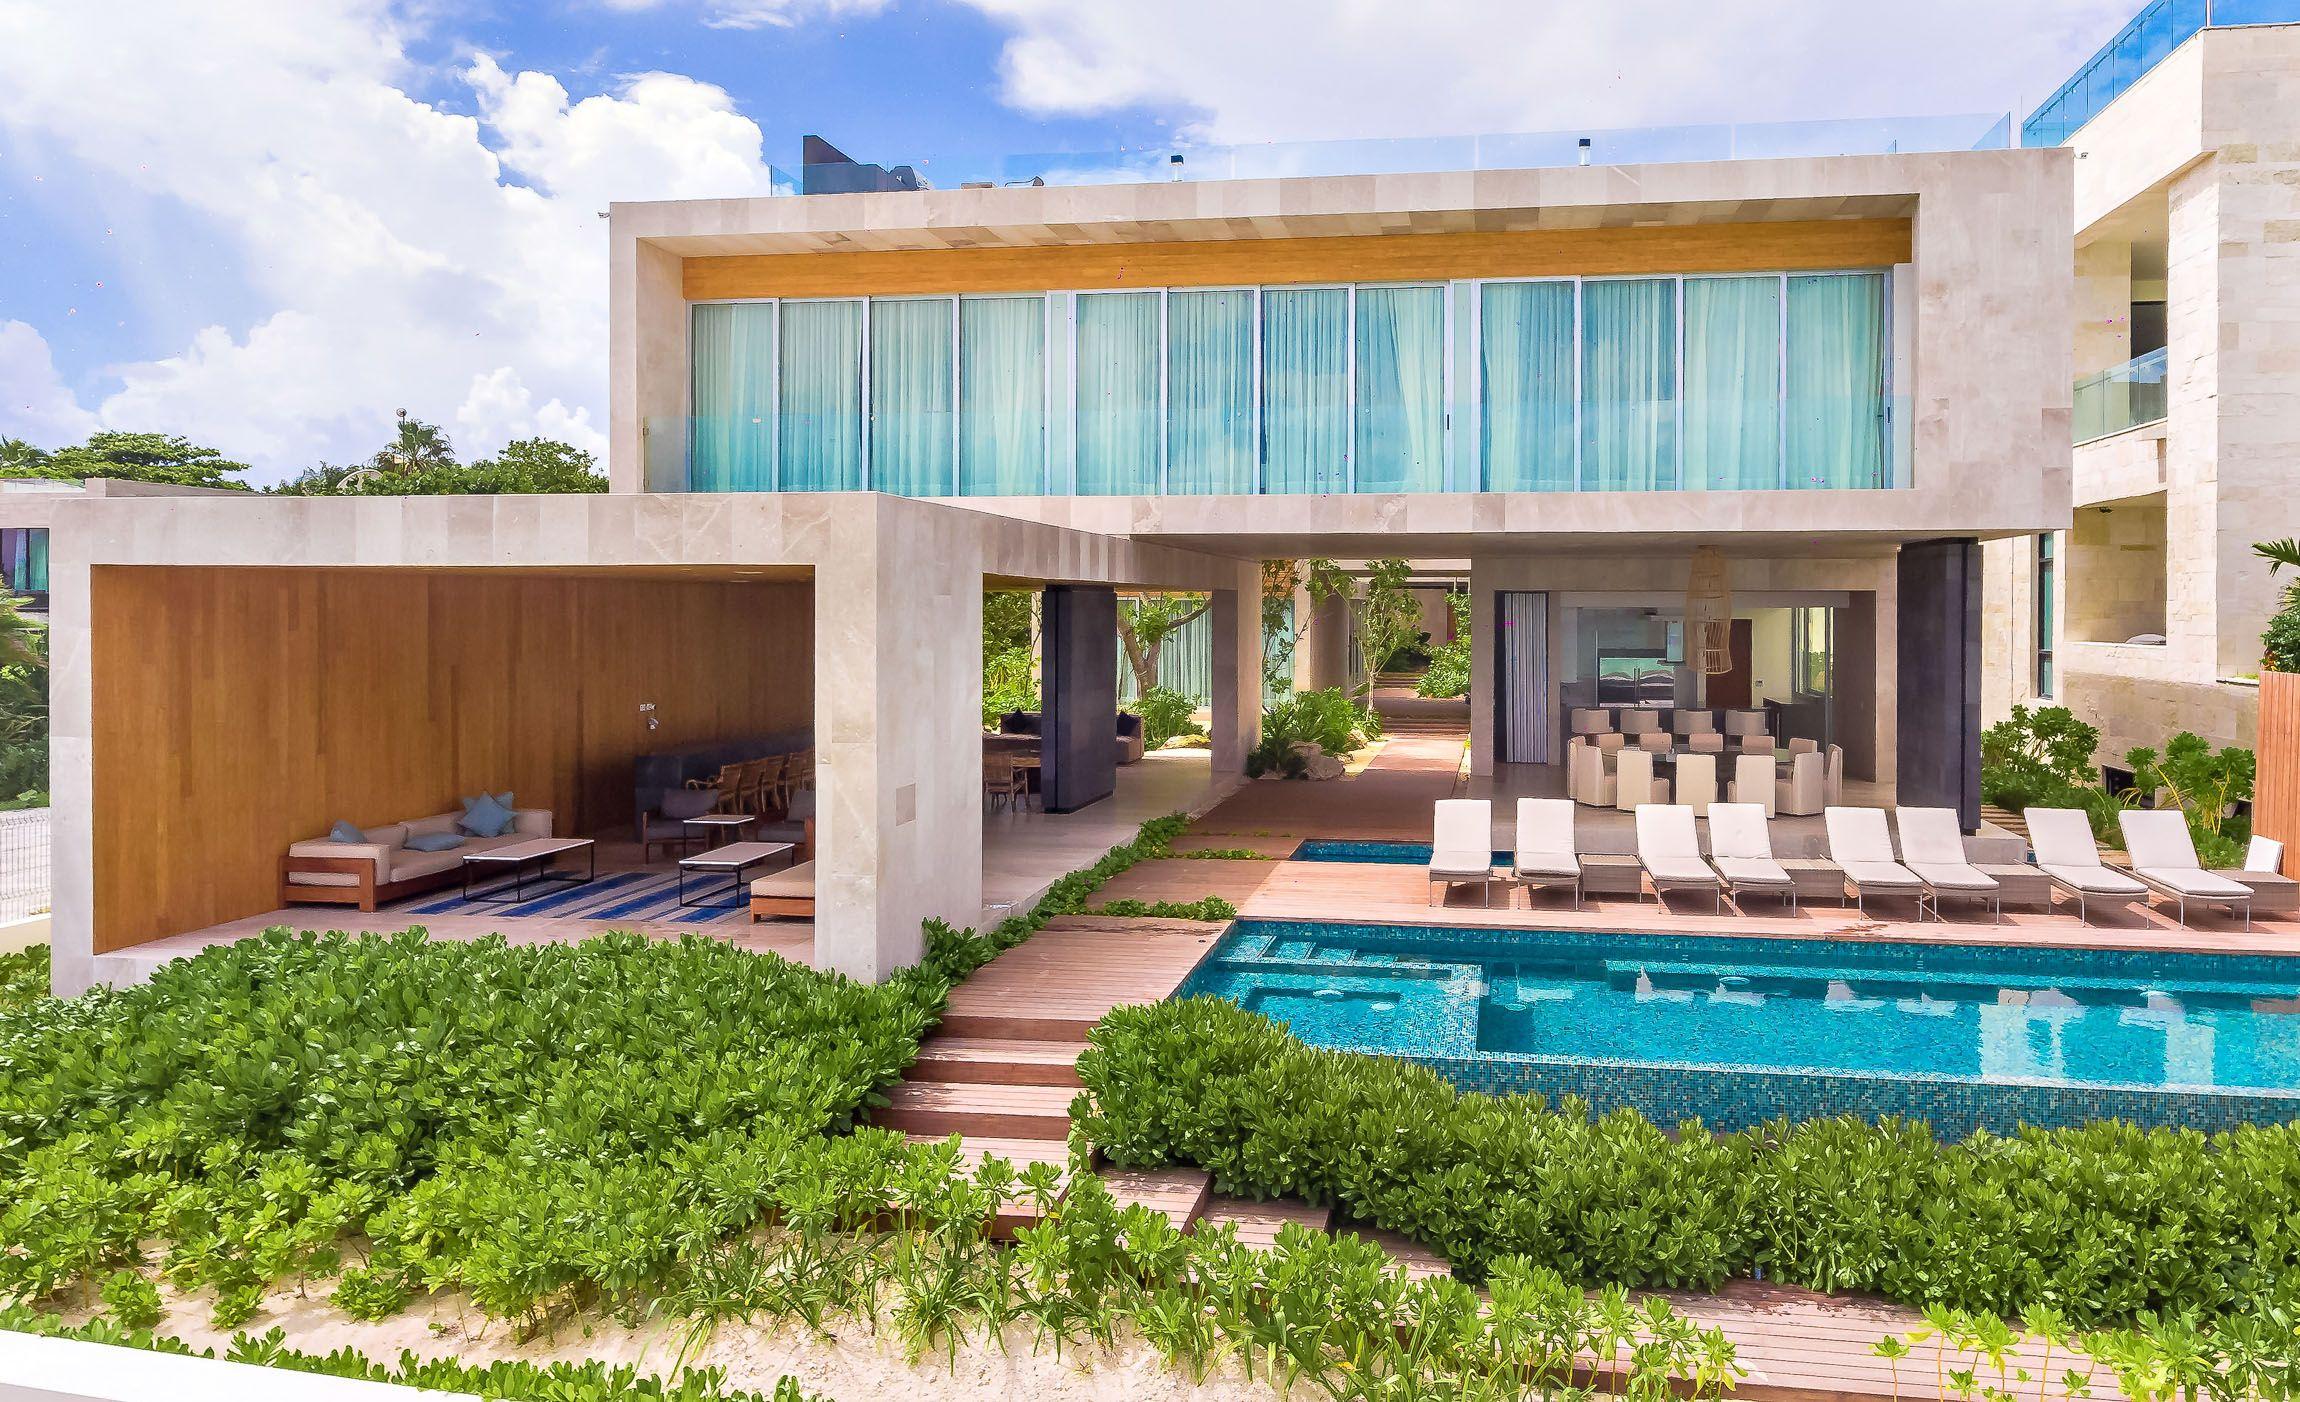 Villa Kin Ich Playa Del Carmen Riviera Maya Mexico